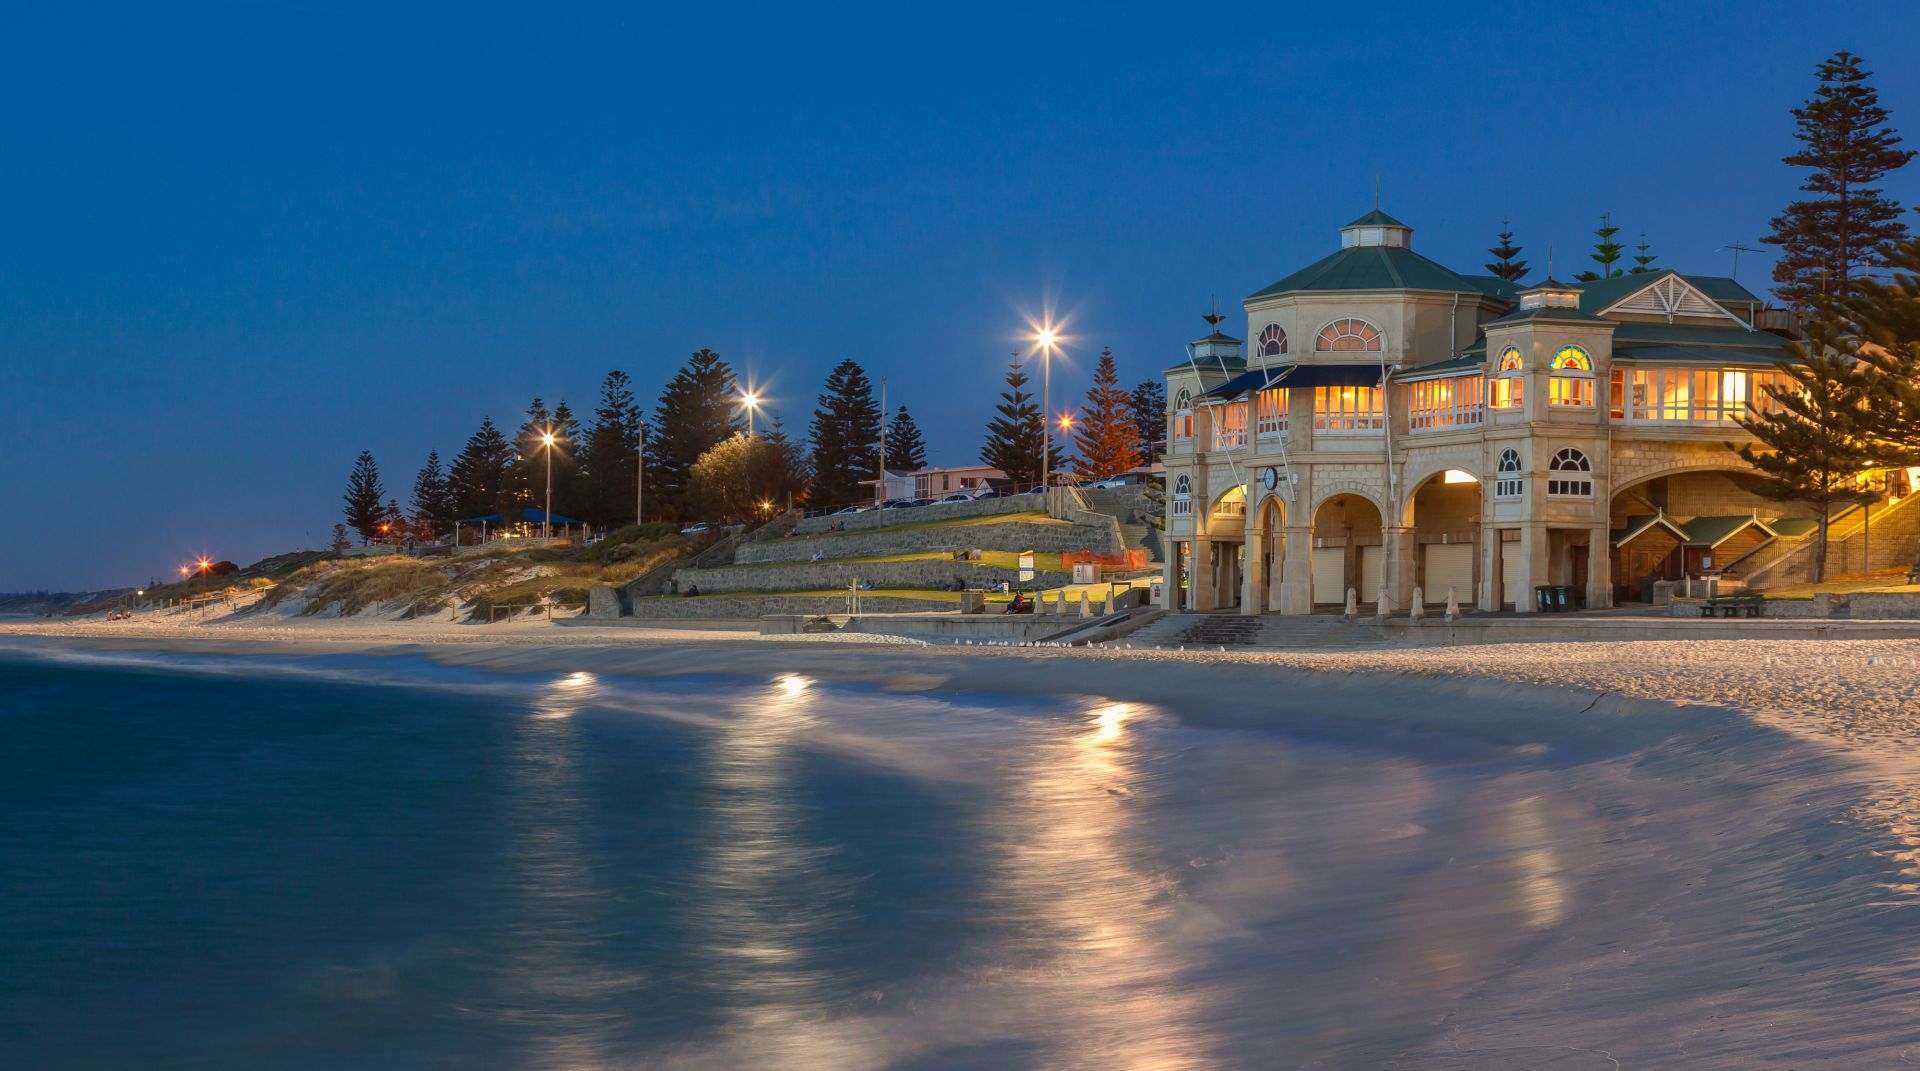 Pohled na moře v Perthu